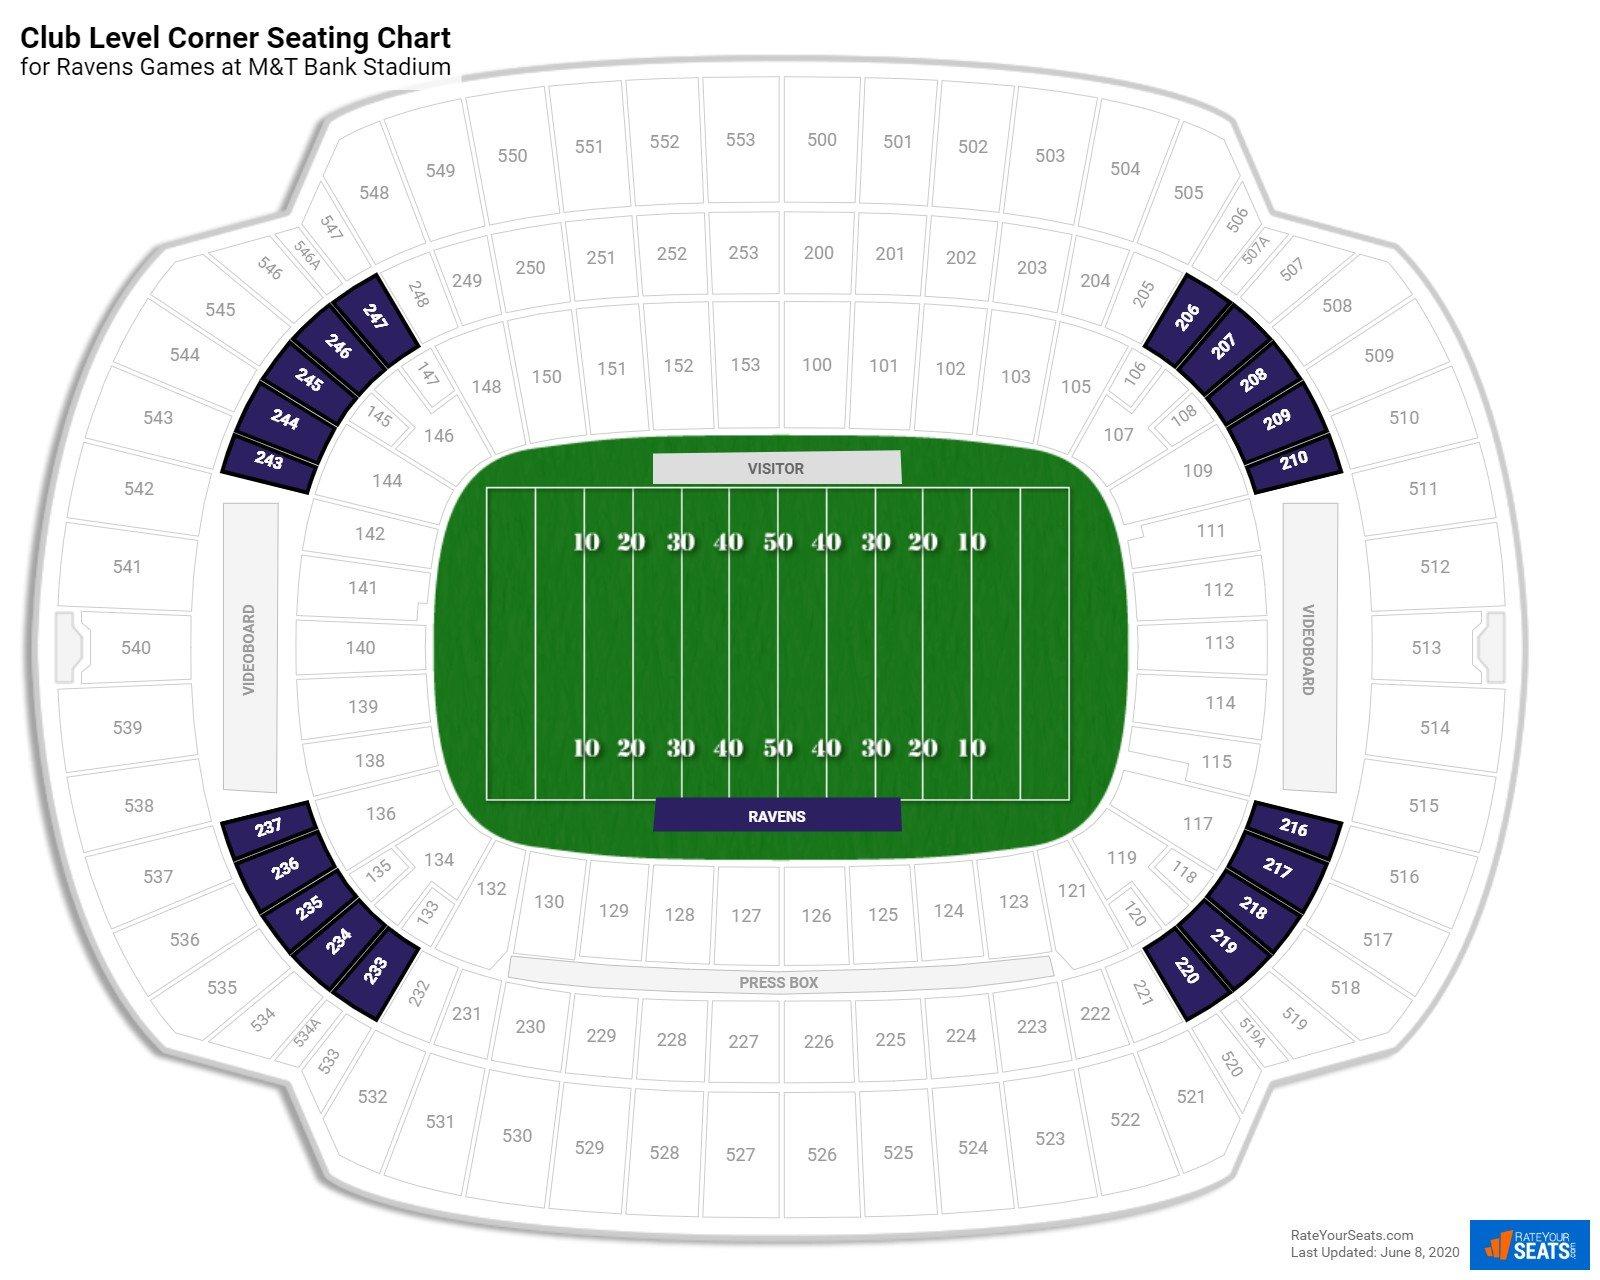 Club Level Corner - M&T Bank Stadium Football Seating ...